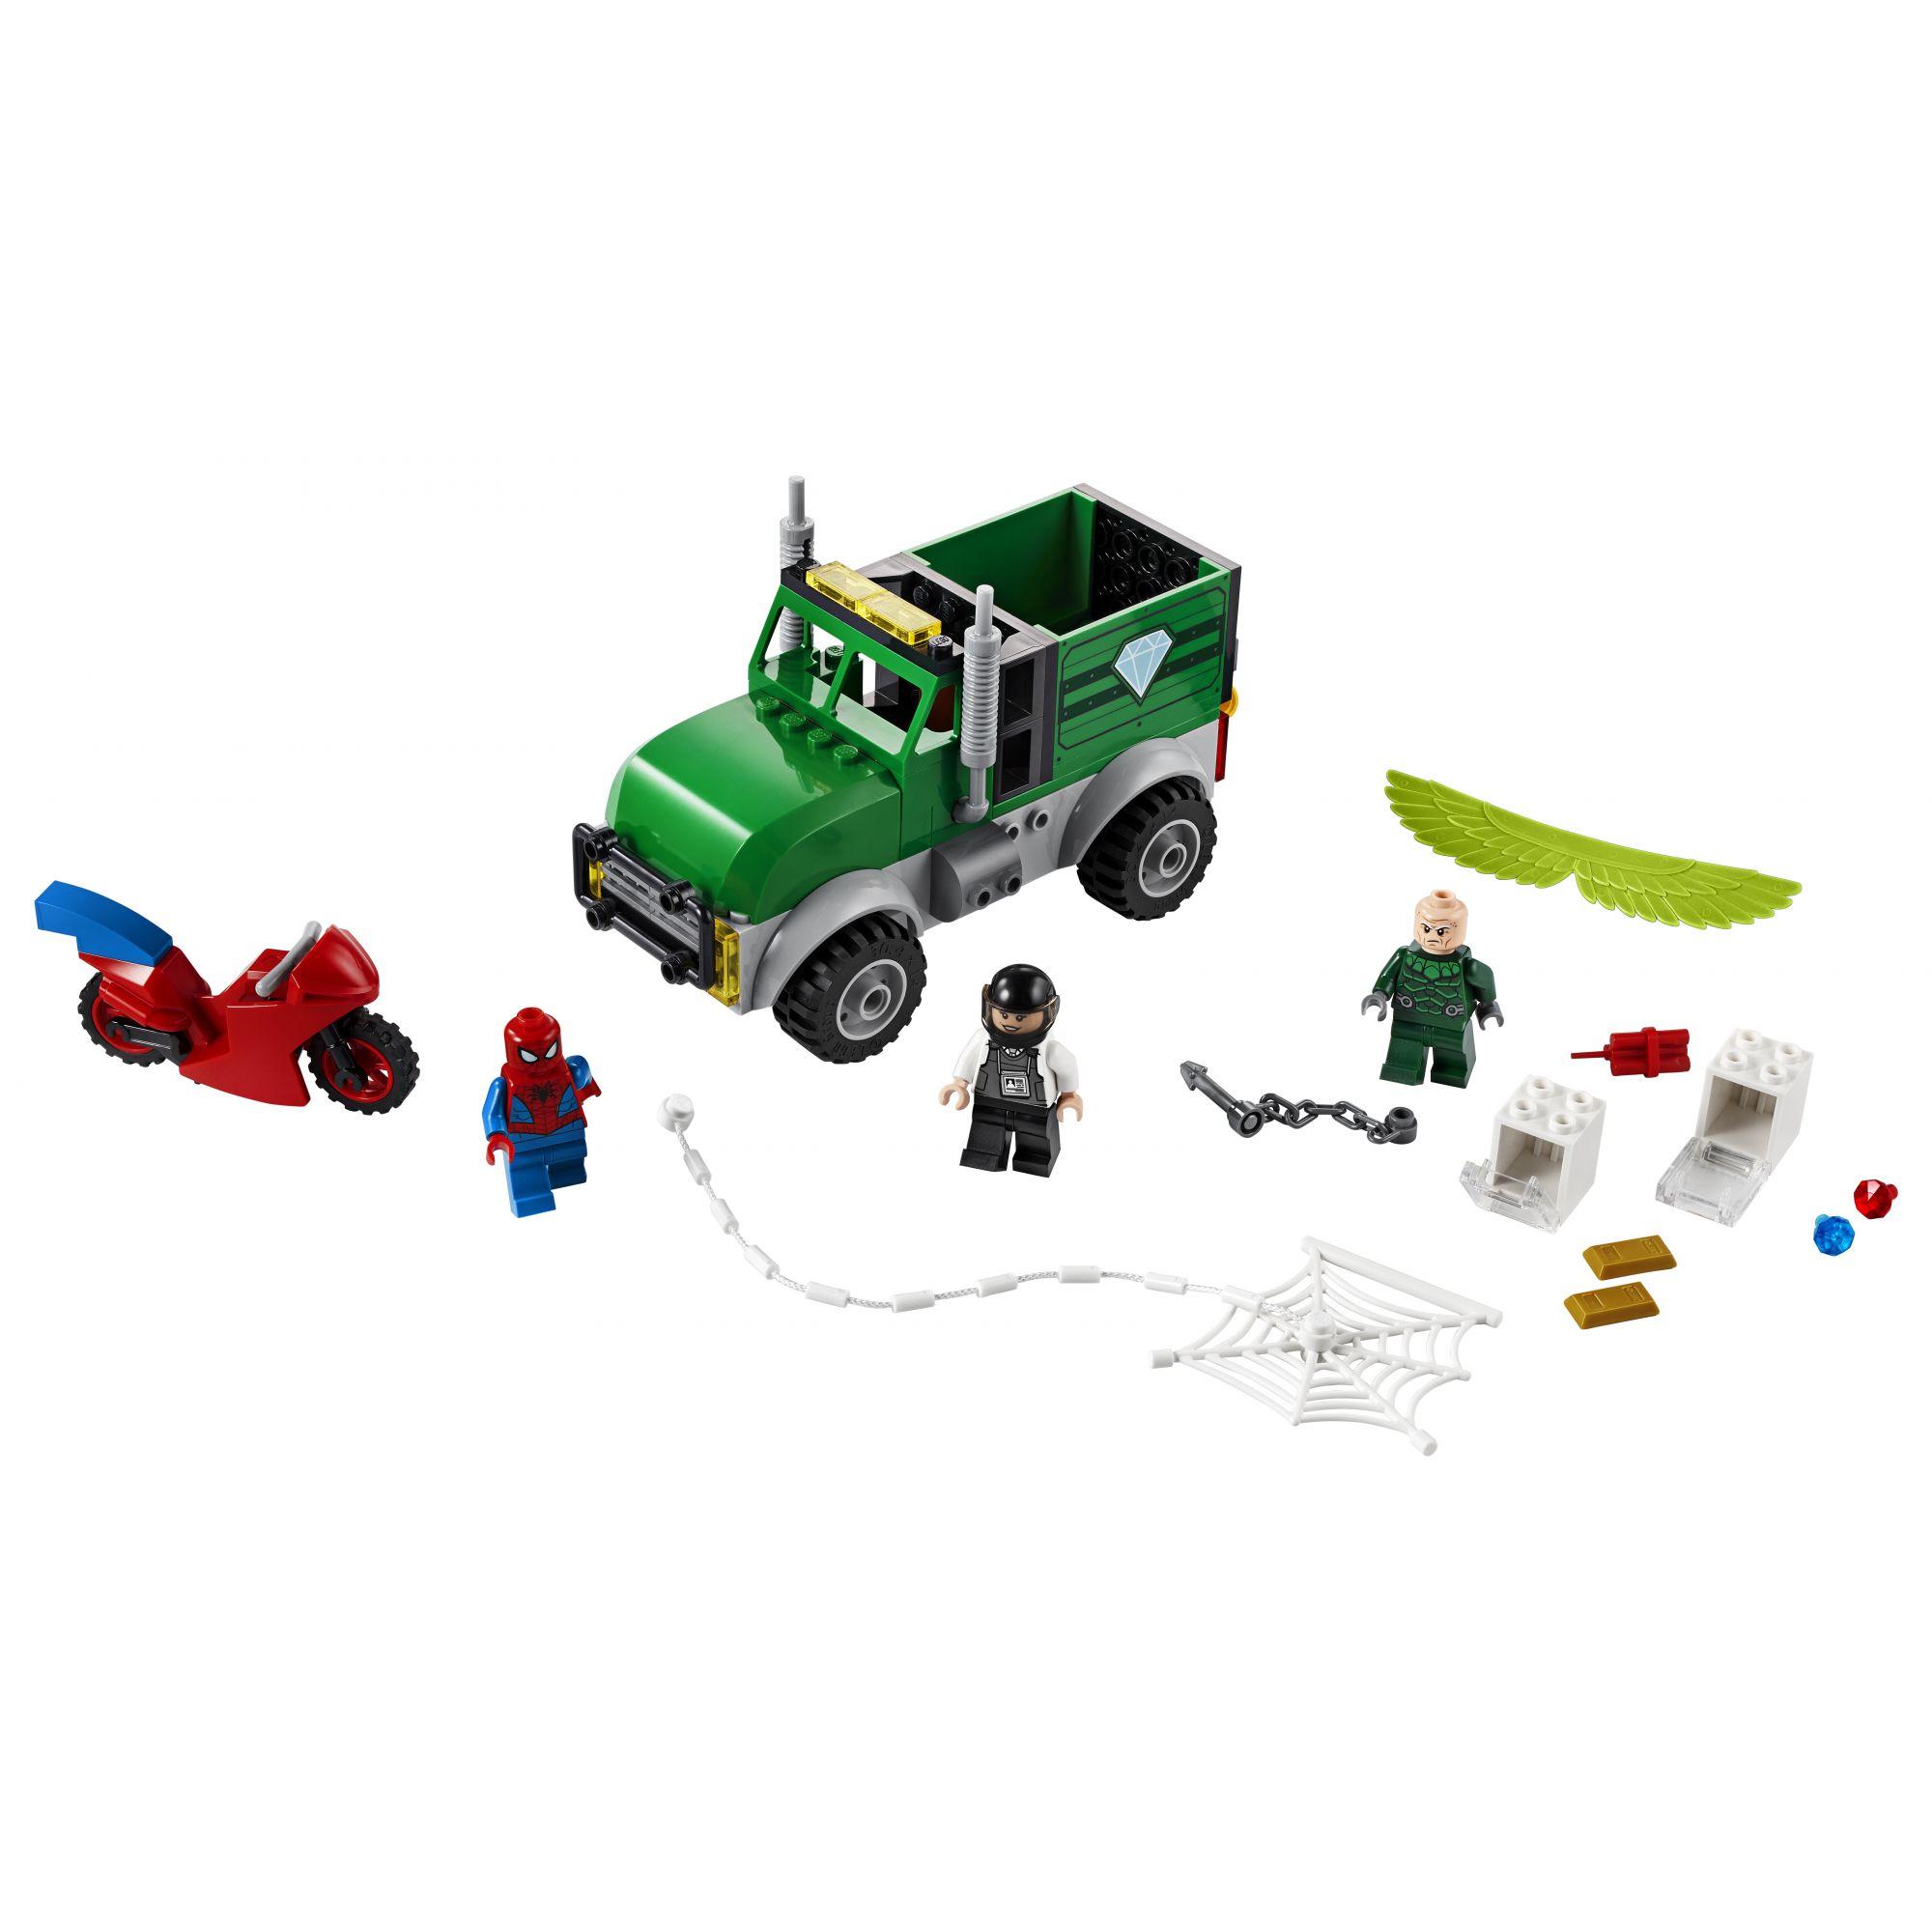 LEGO Marvel Super Heroes Avvoltoio e la rapina del camion - 76147